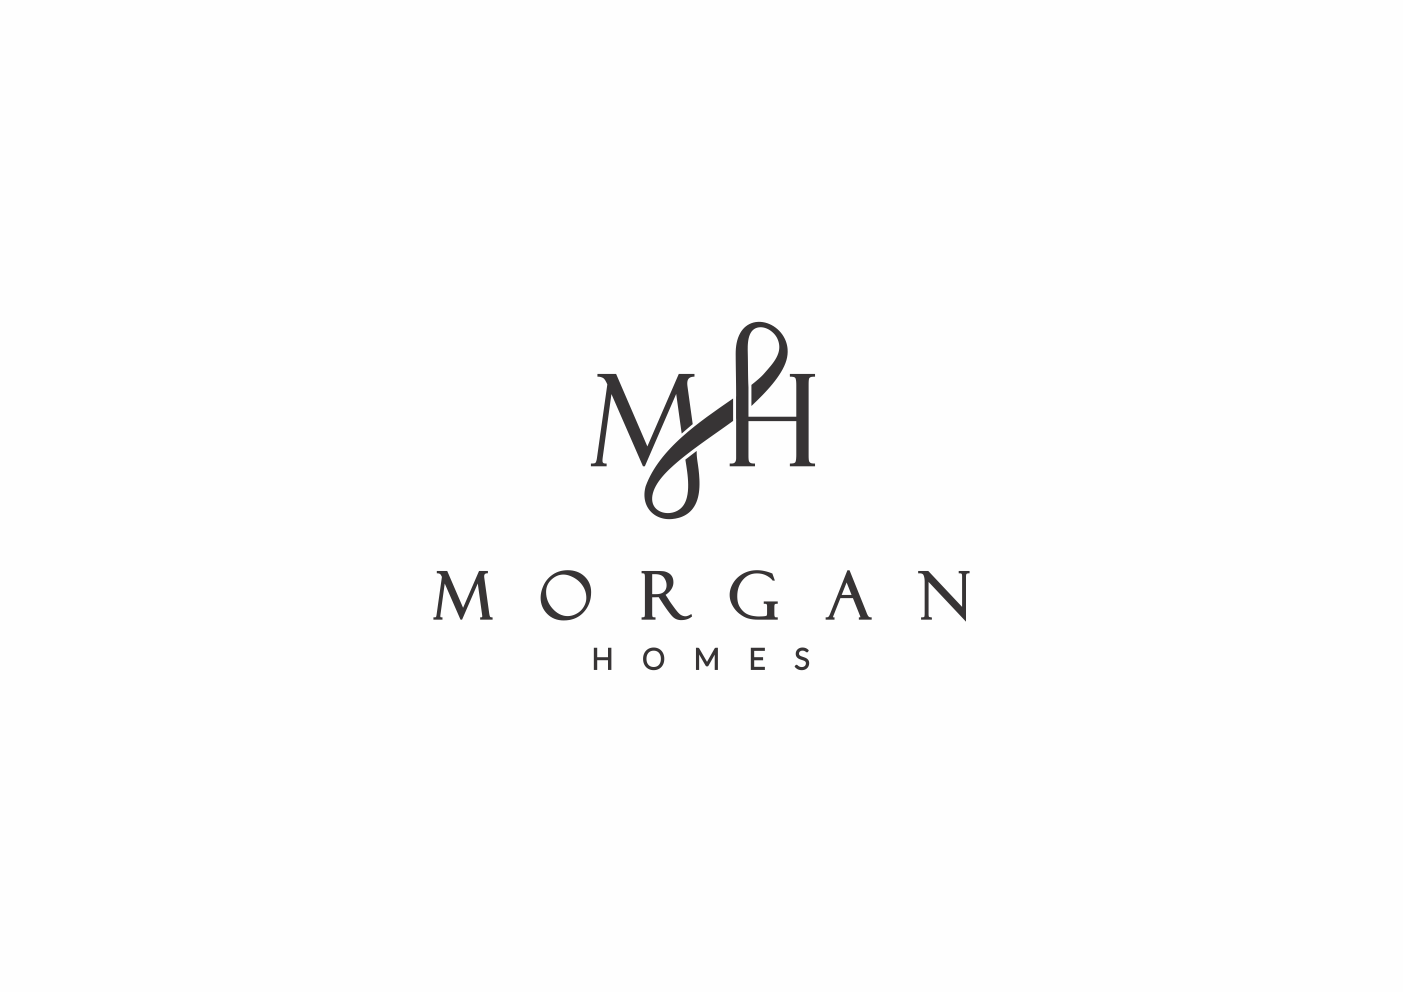 Upmarket, Professional, Business Logo Design for Morgan Homes by ...